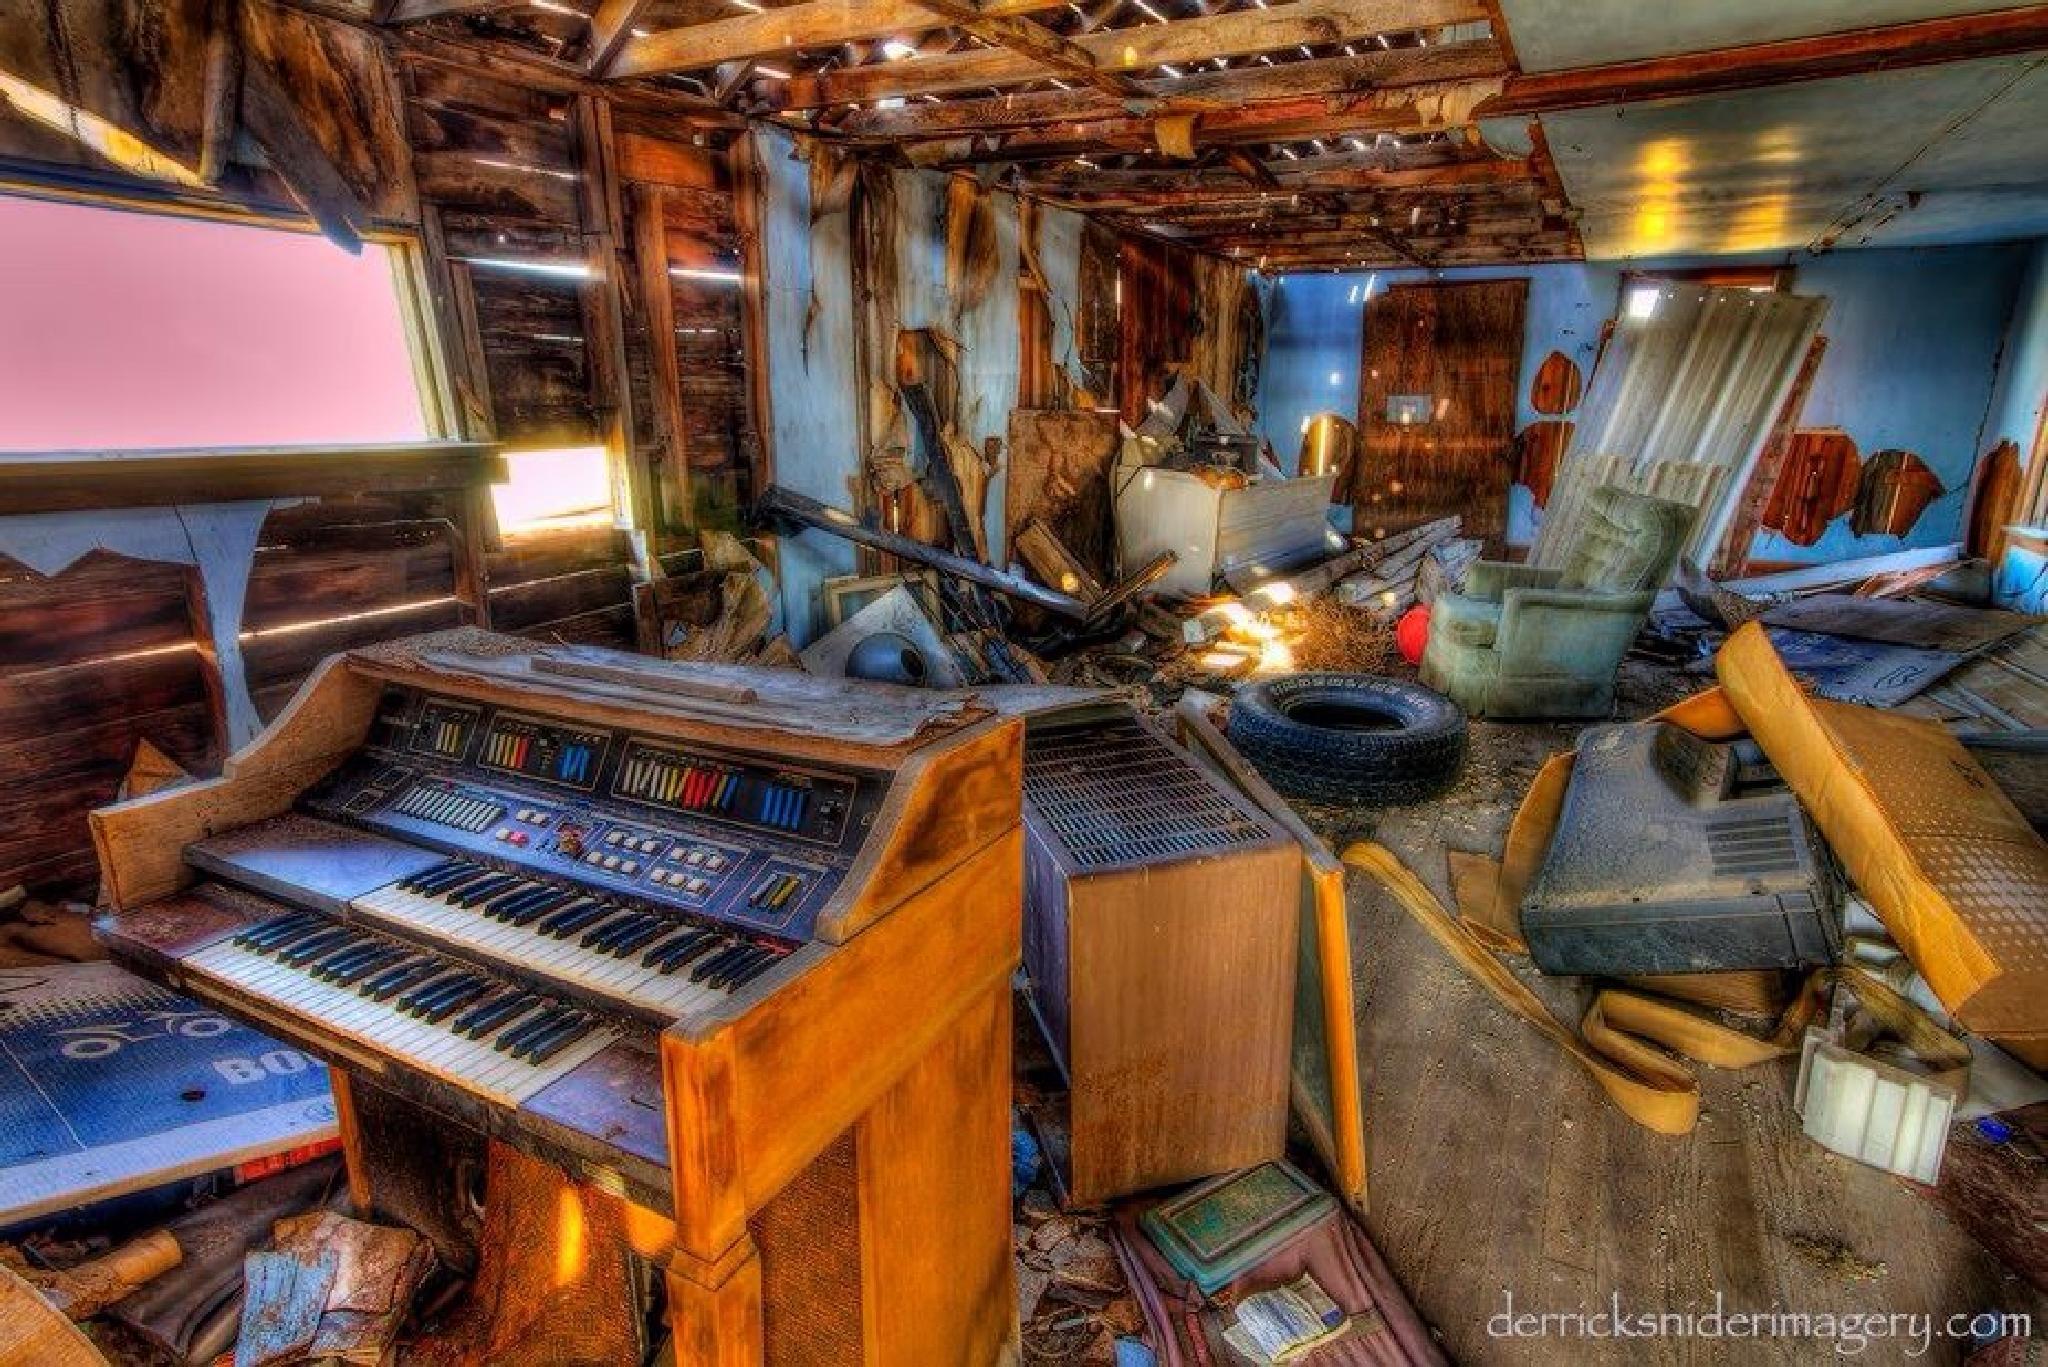 Lair Of The Organ Grinder by derricksniderimagery